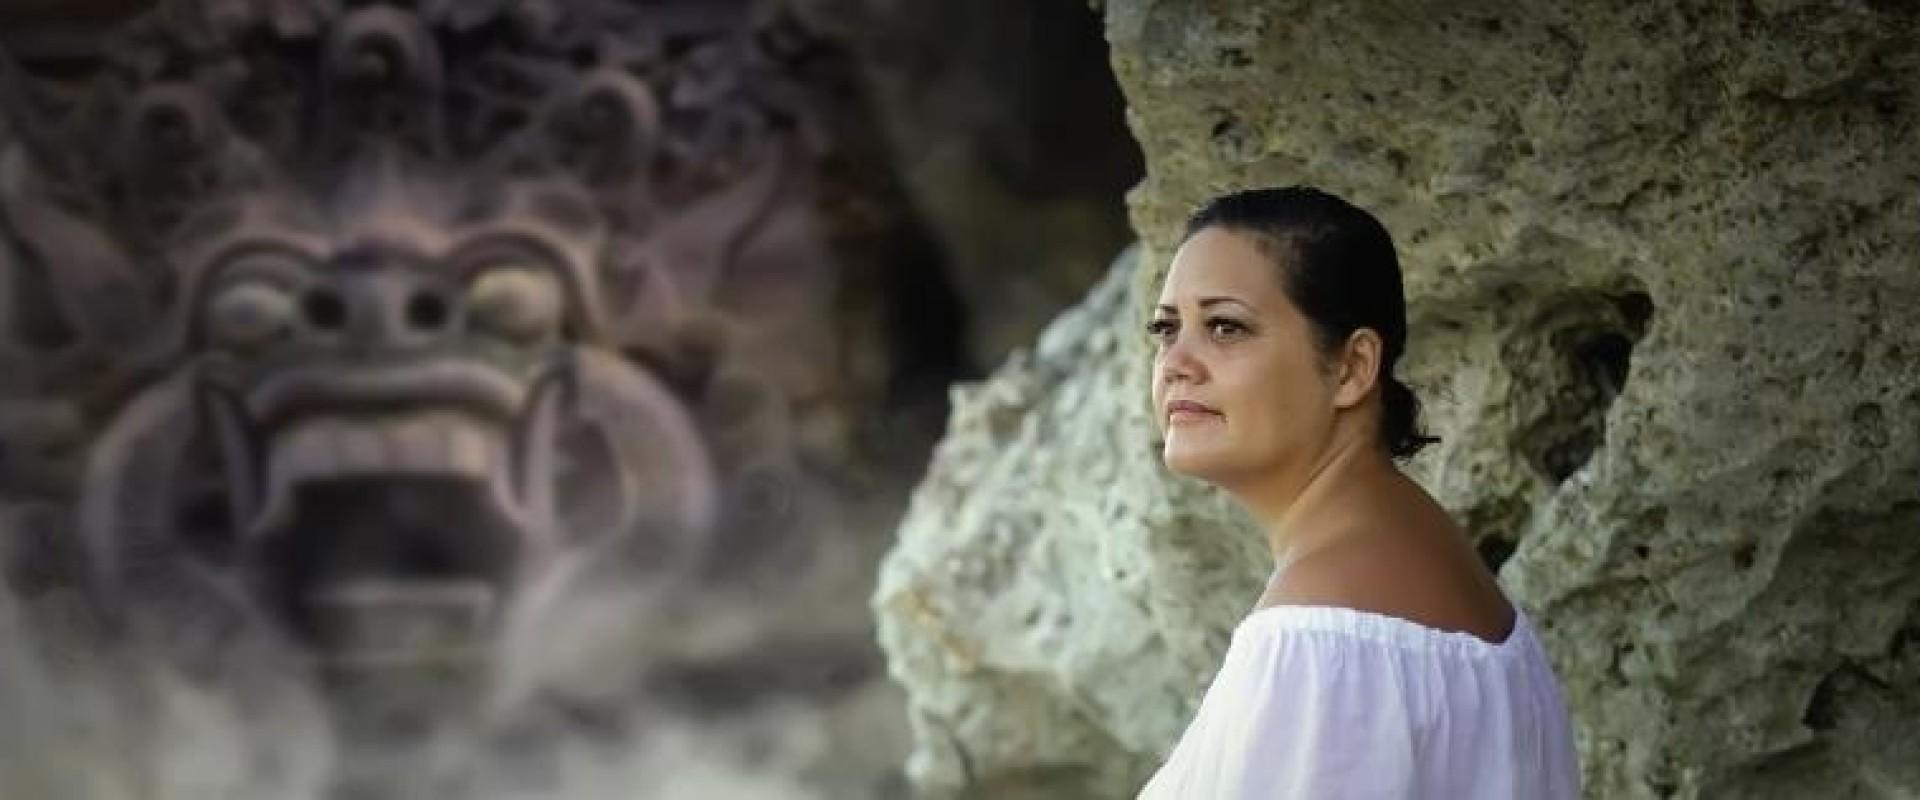 MH17: ROUWEN, HOE DAN?! - FAMILIECONTEXT